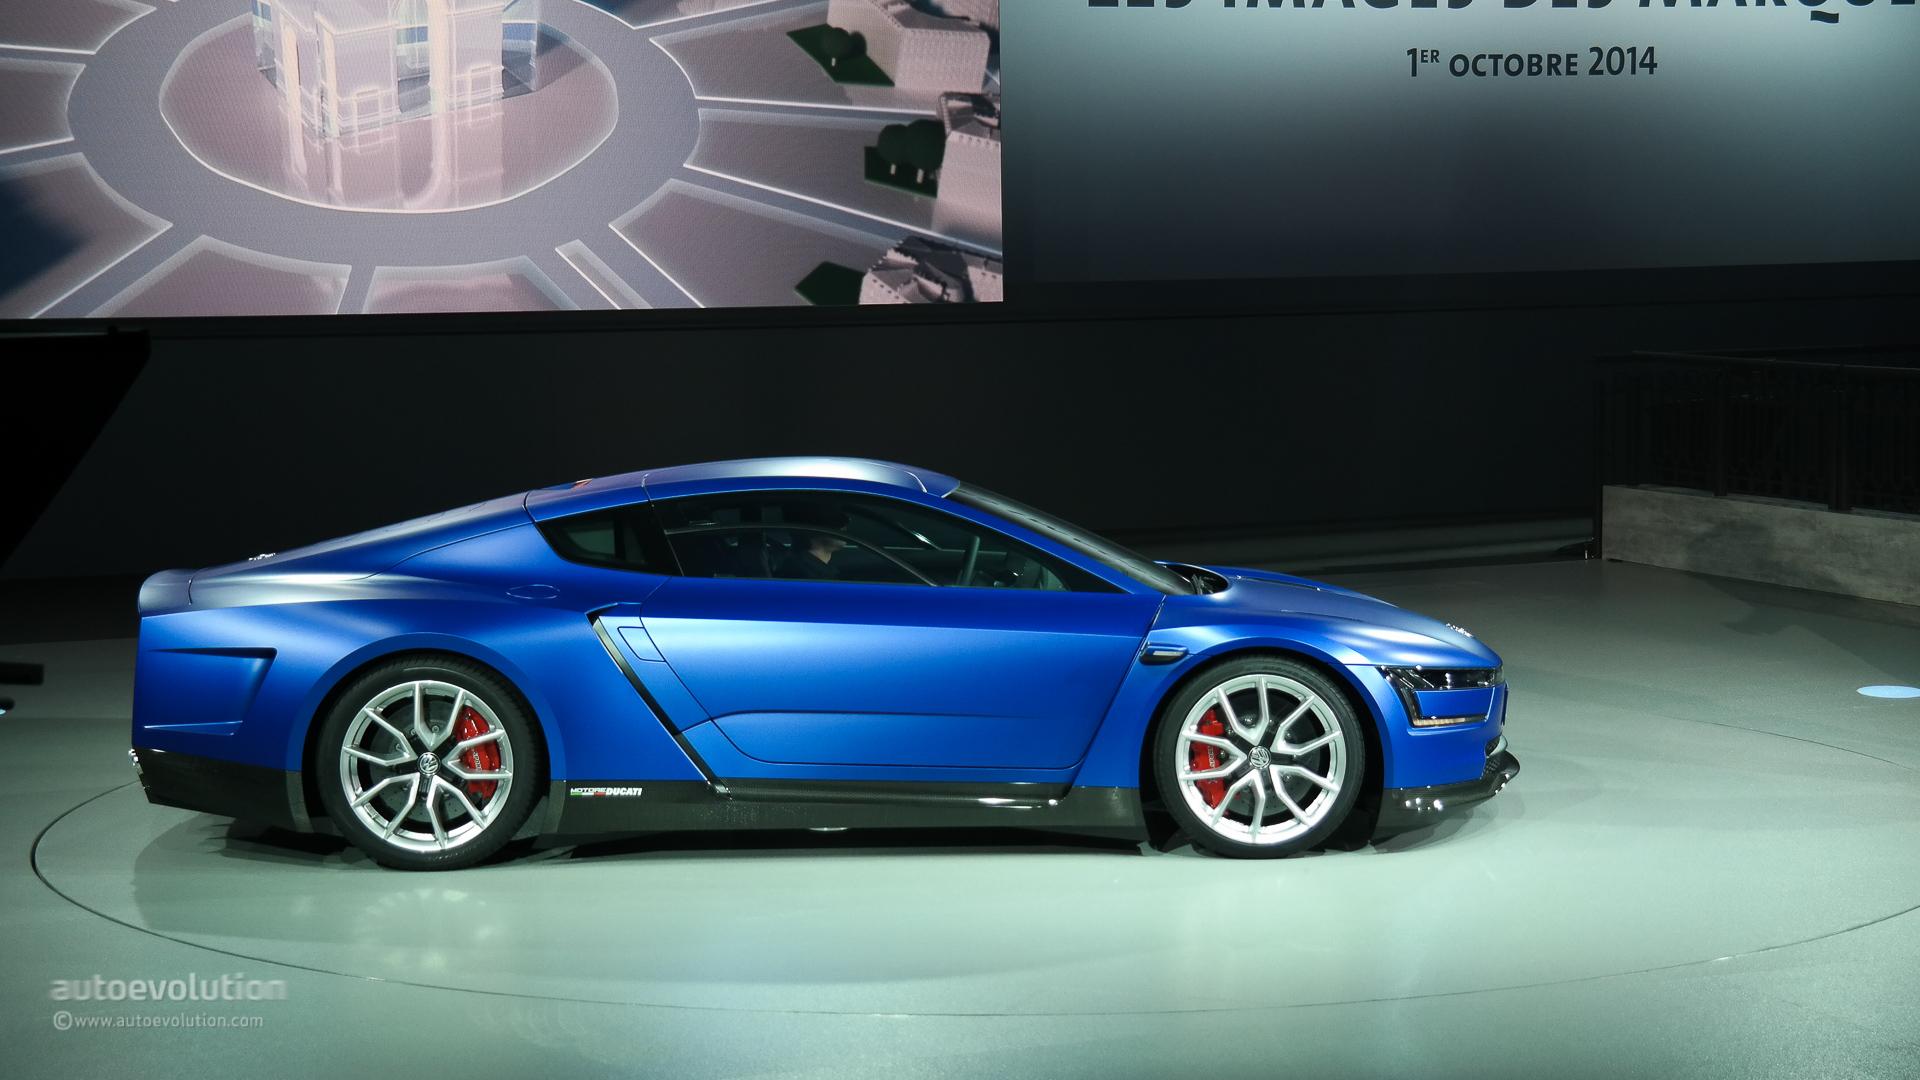 volkswagen reveals xl sport powered by 200 hp ducati